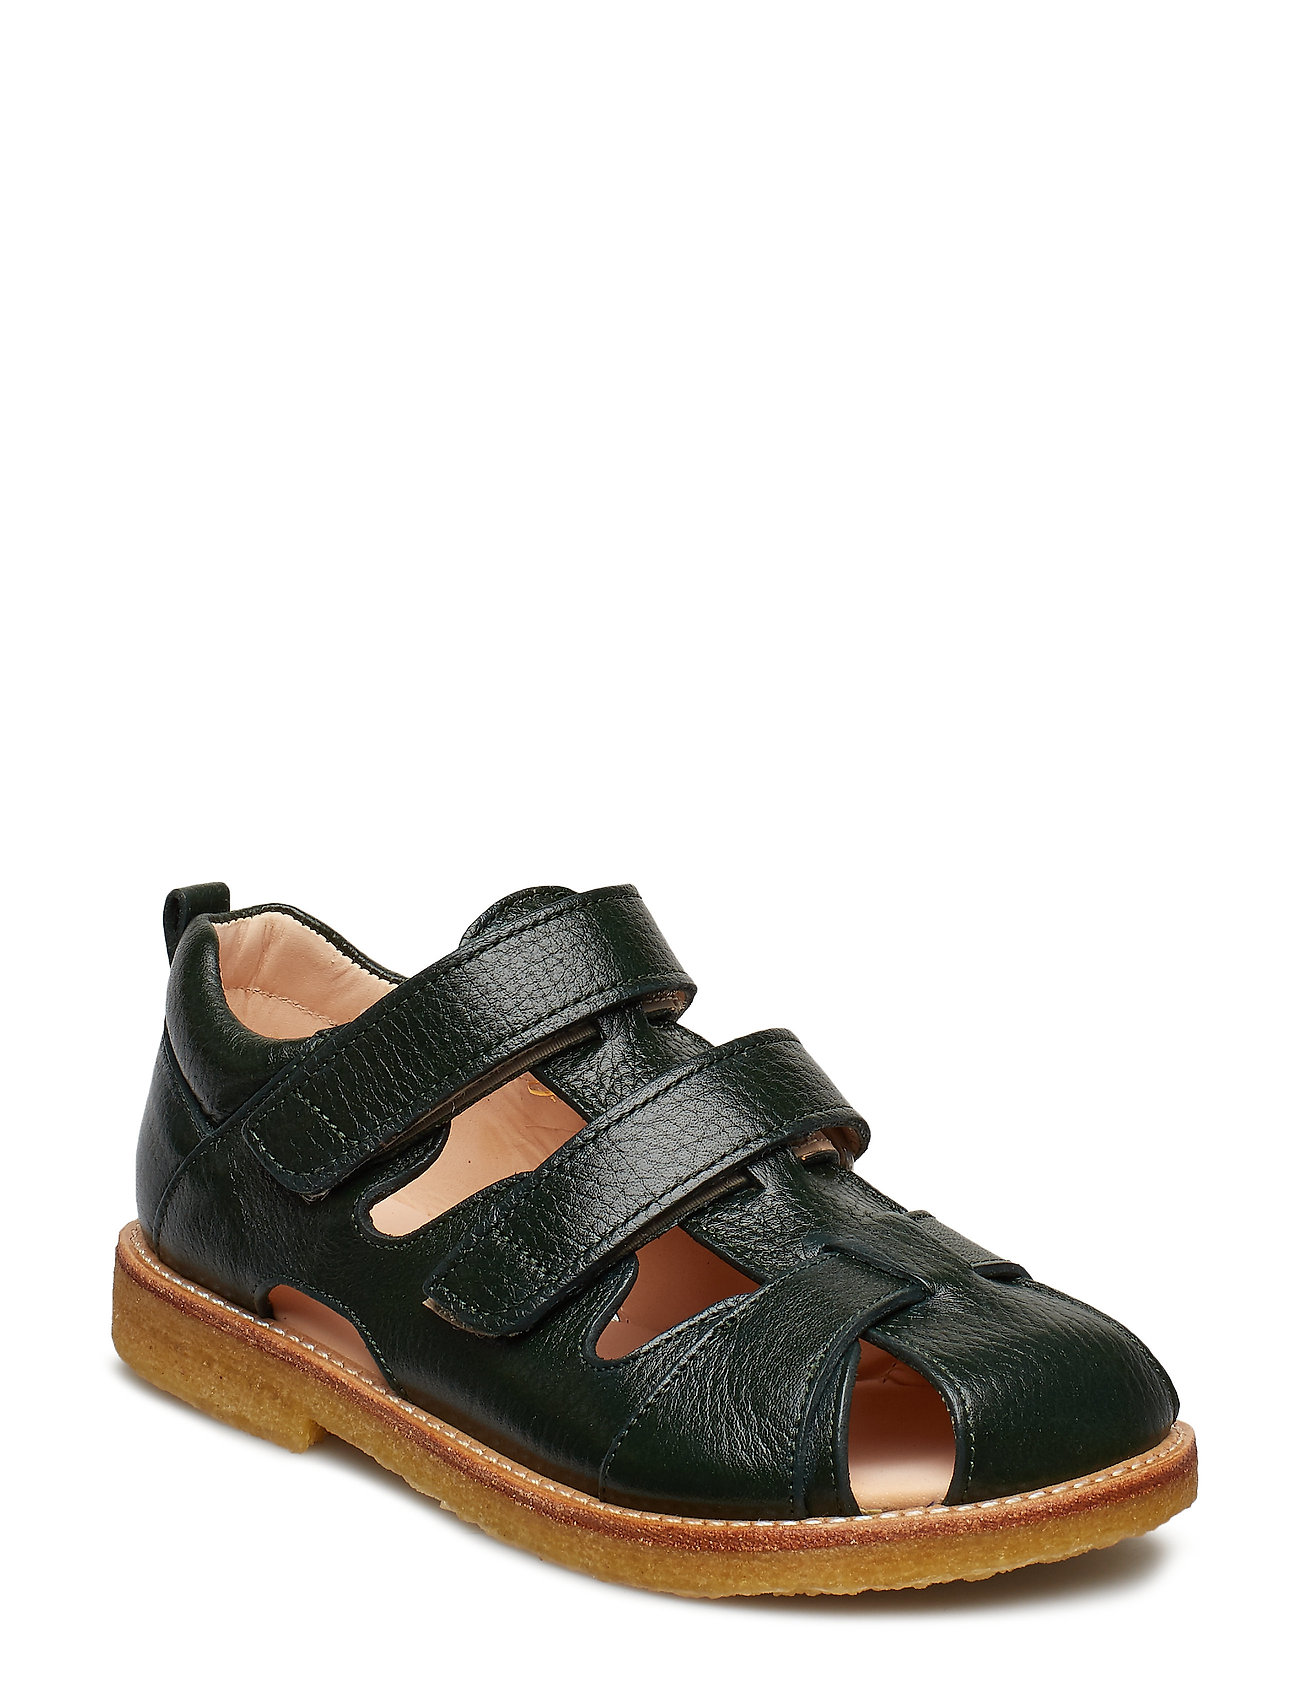 Sandals Flat Closed Toe Sandaler Grøn ANGULUS